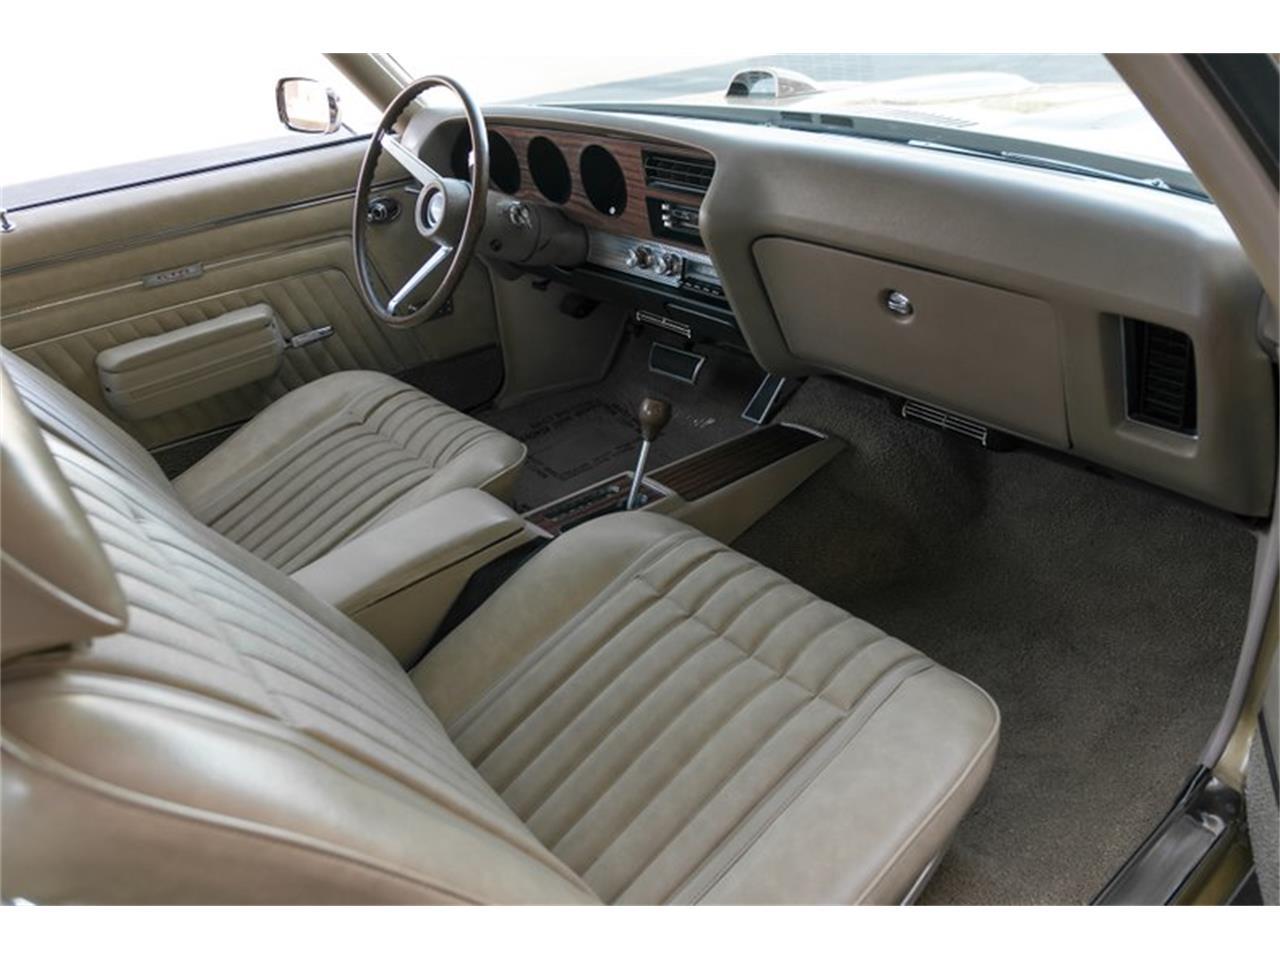 Large Picture of Classic 1970 Pontiac GTO - $59,995.00 - QKPX